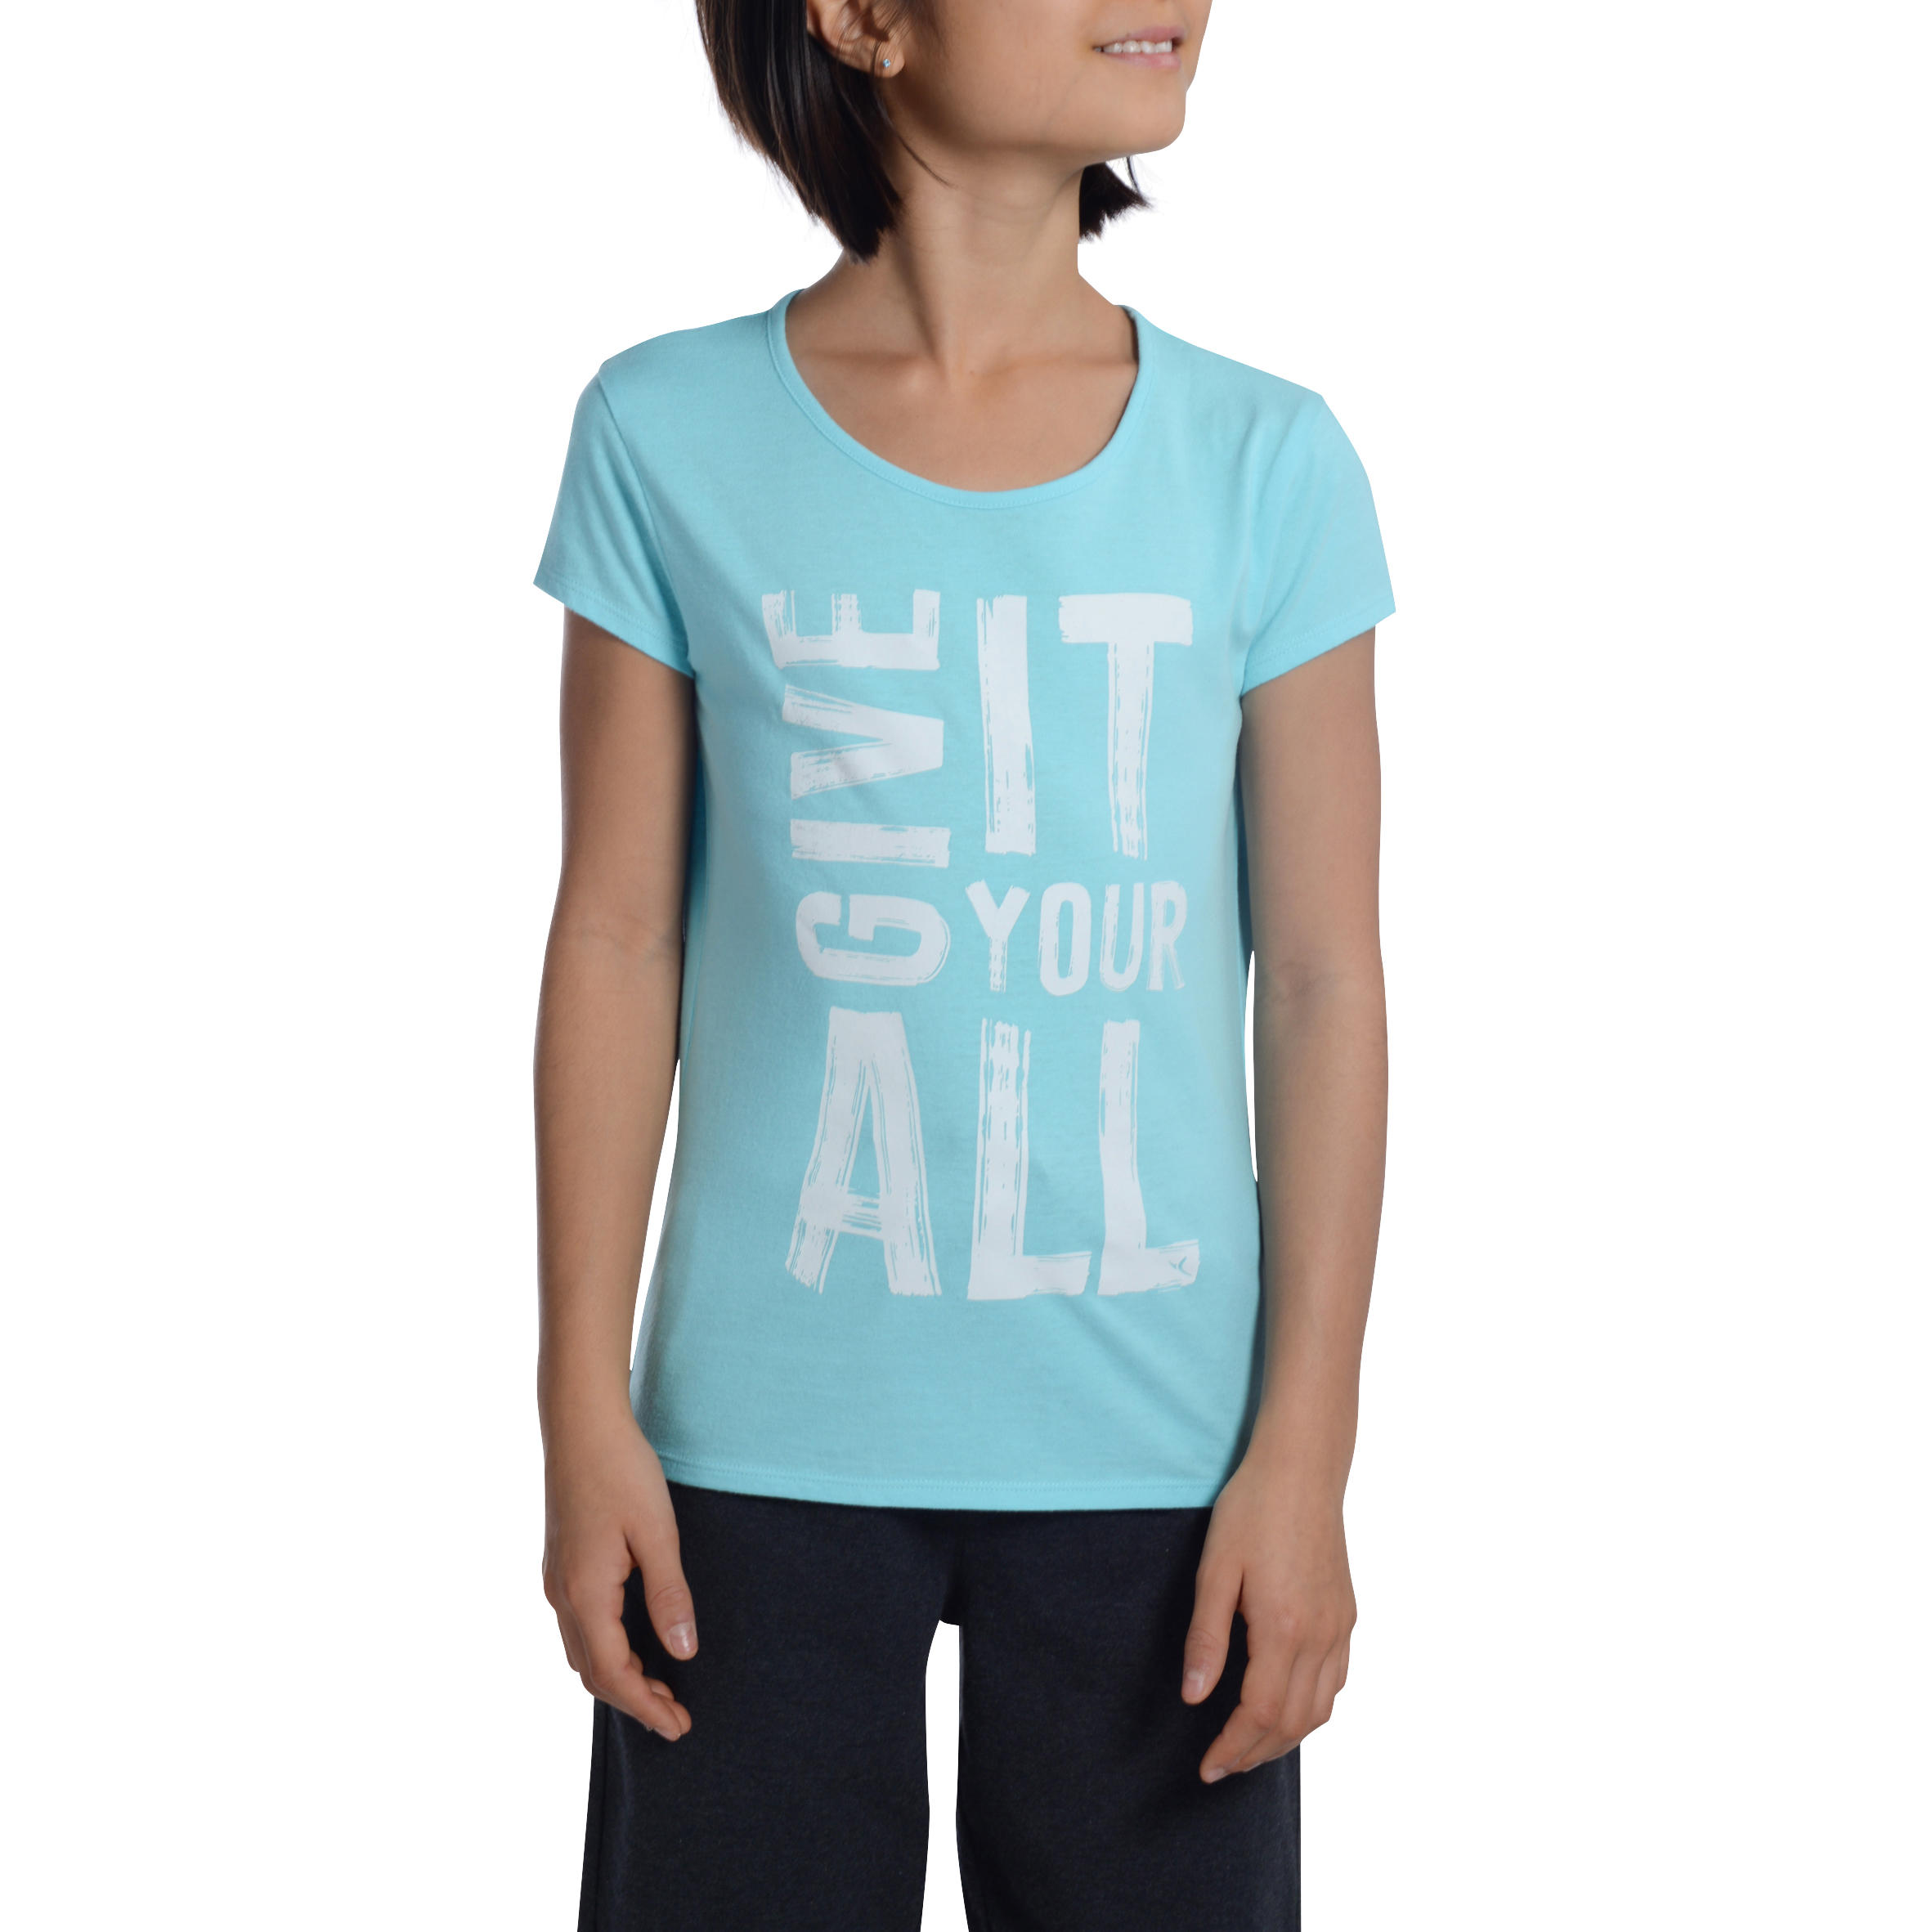 Girls' Short-Sleeved Gym T-Shirt - Blue